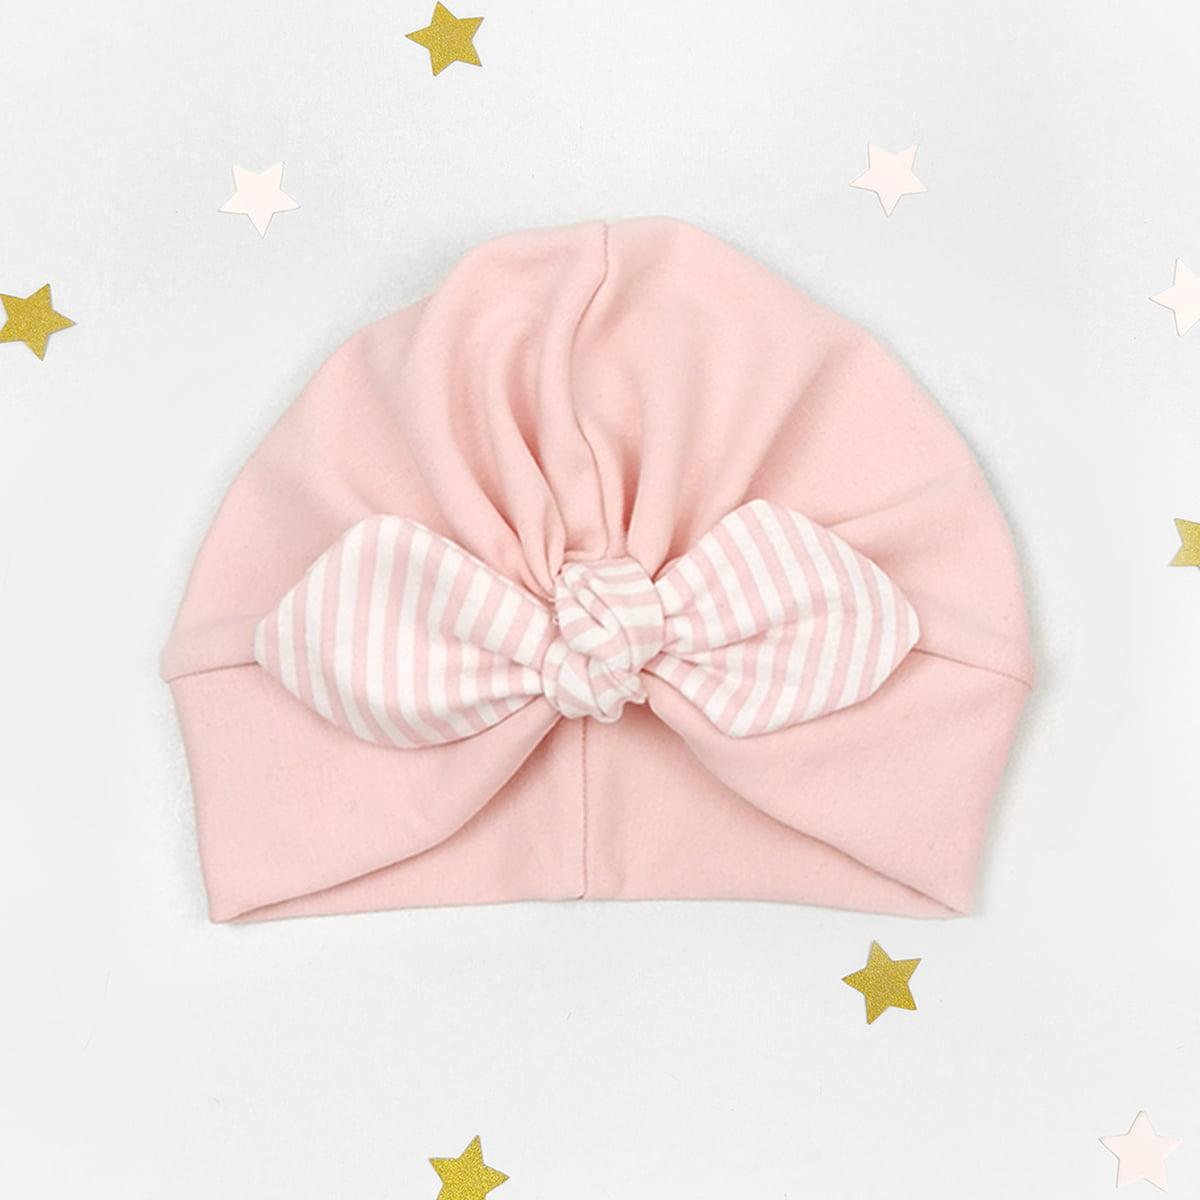 mašna rozi topli zimski turban za bebe i djevojčice